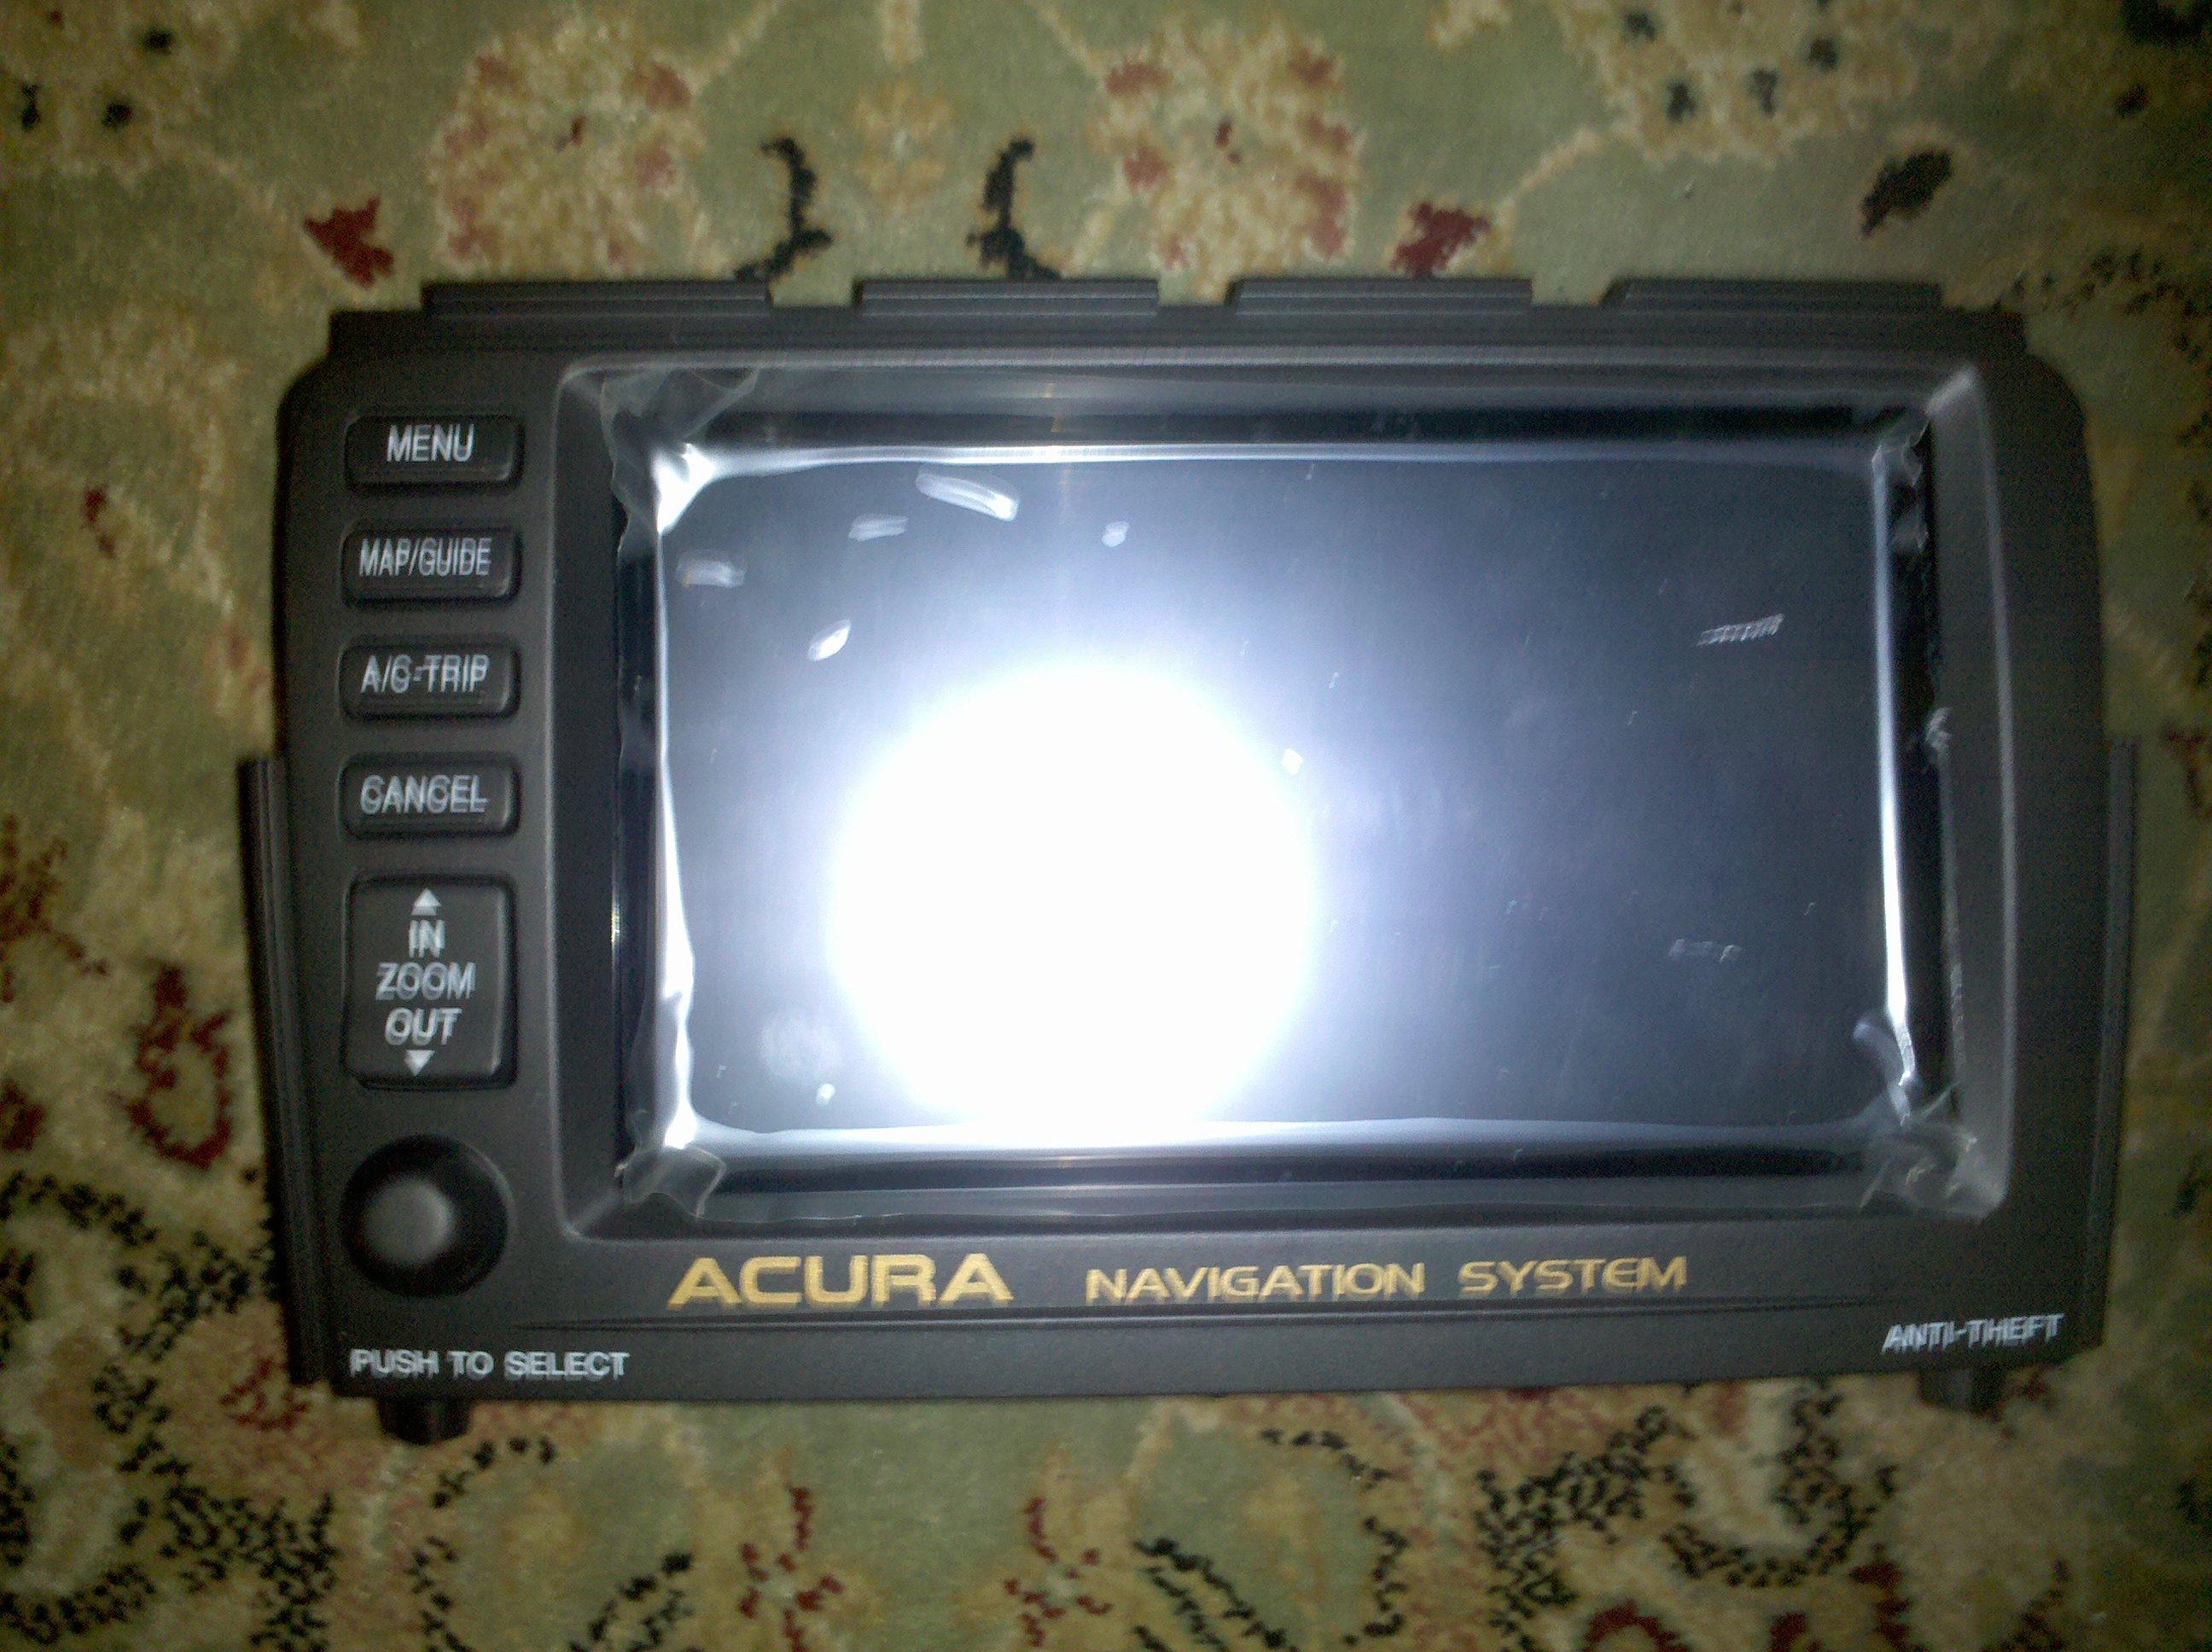 Acura MDX Navigation Screen Acura MDX Forum Acura MDX SUV Forums - Acura mdx navigation system